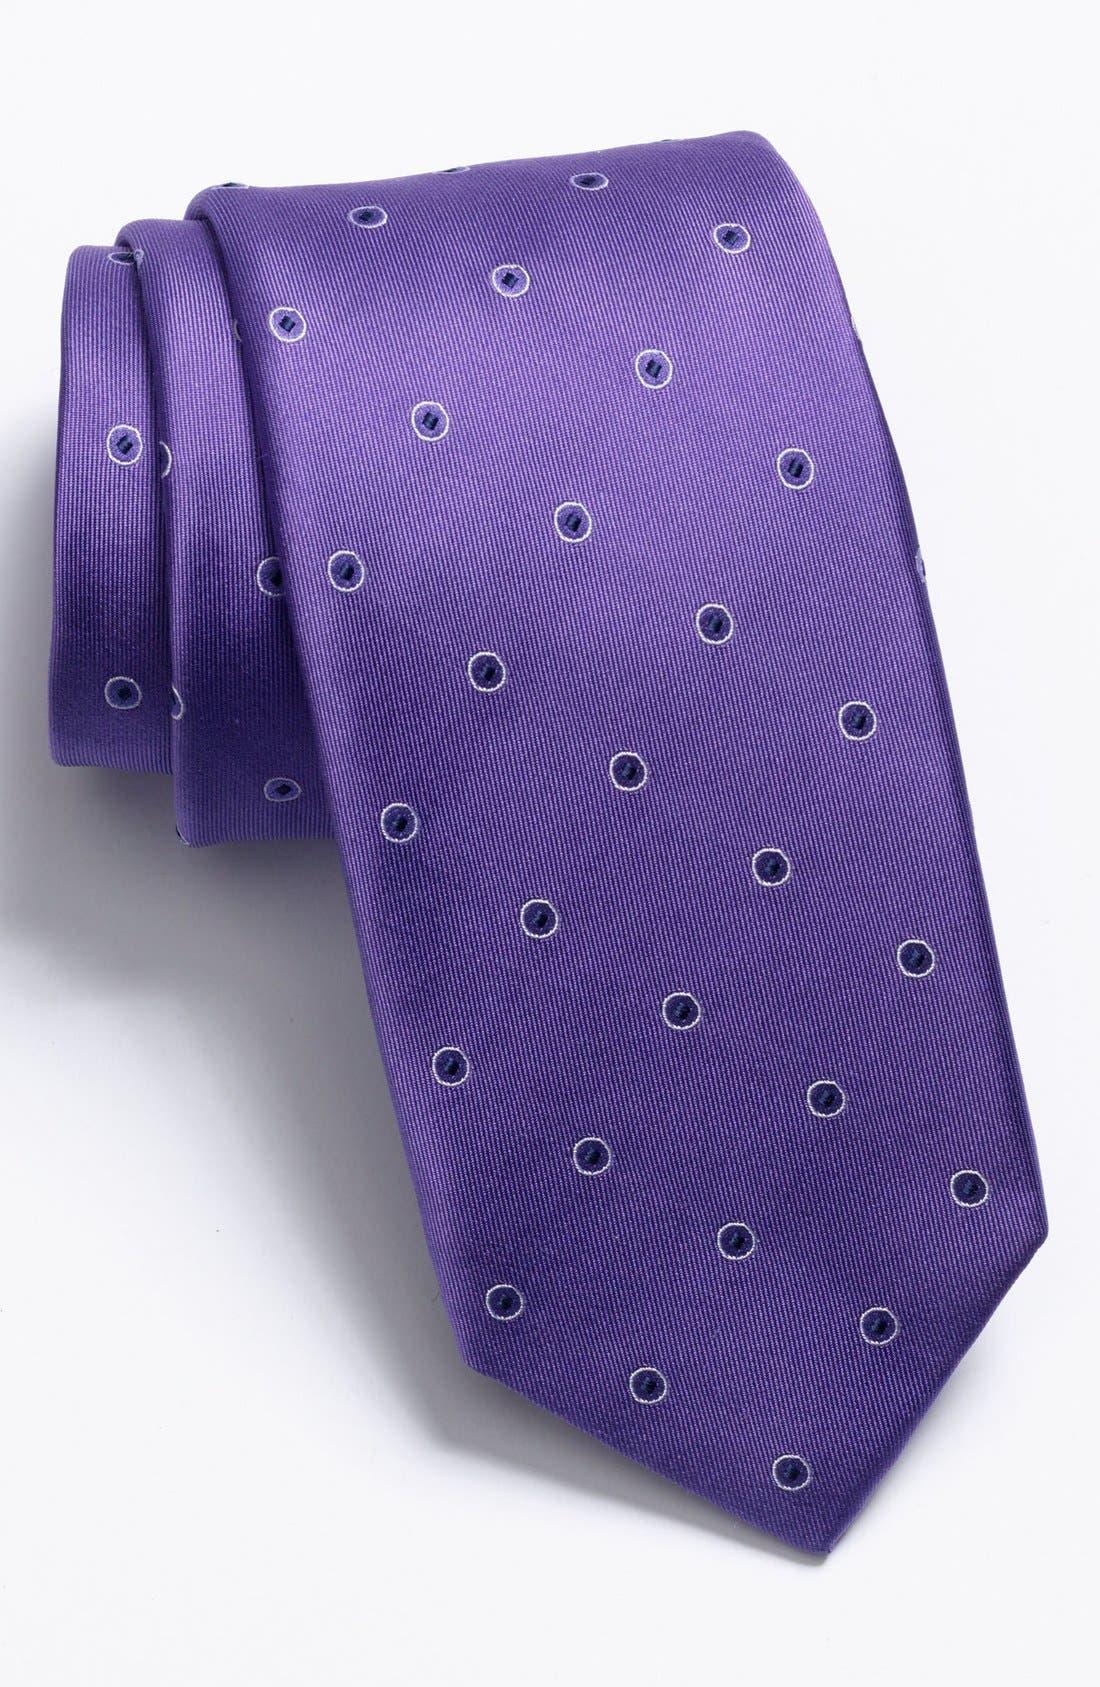 Main Image - Calibrate Dress Shirt & Tie